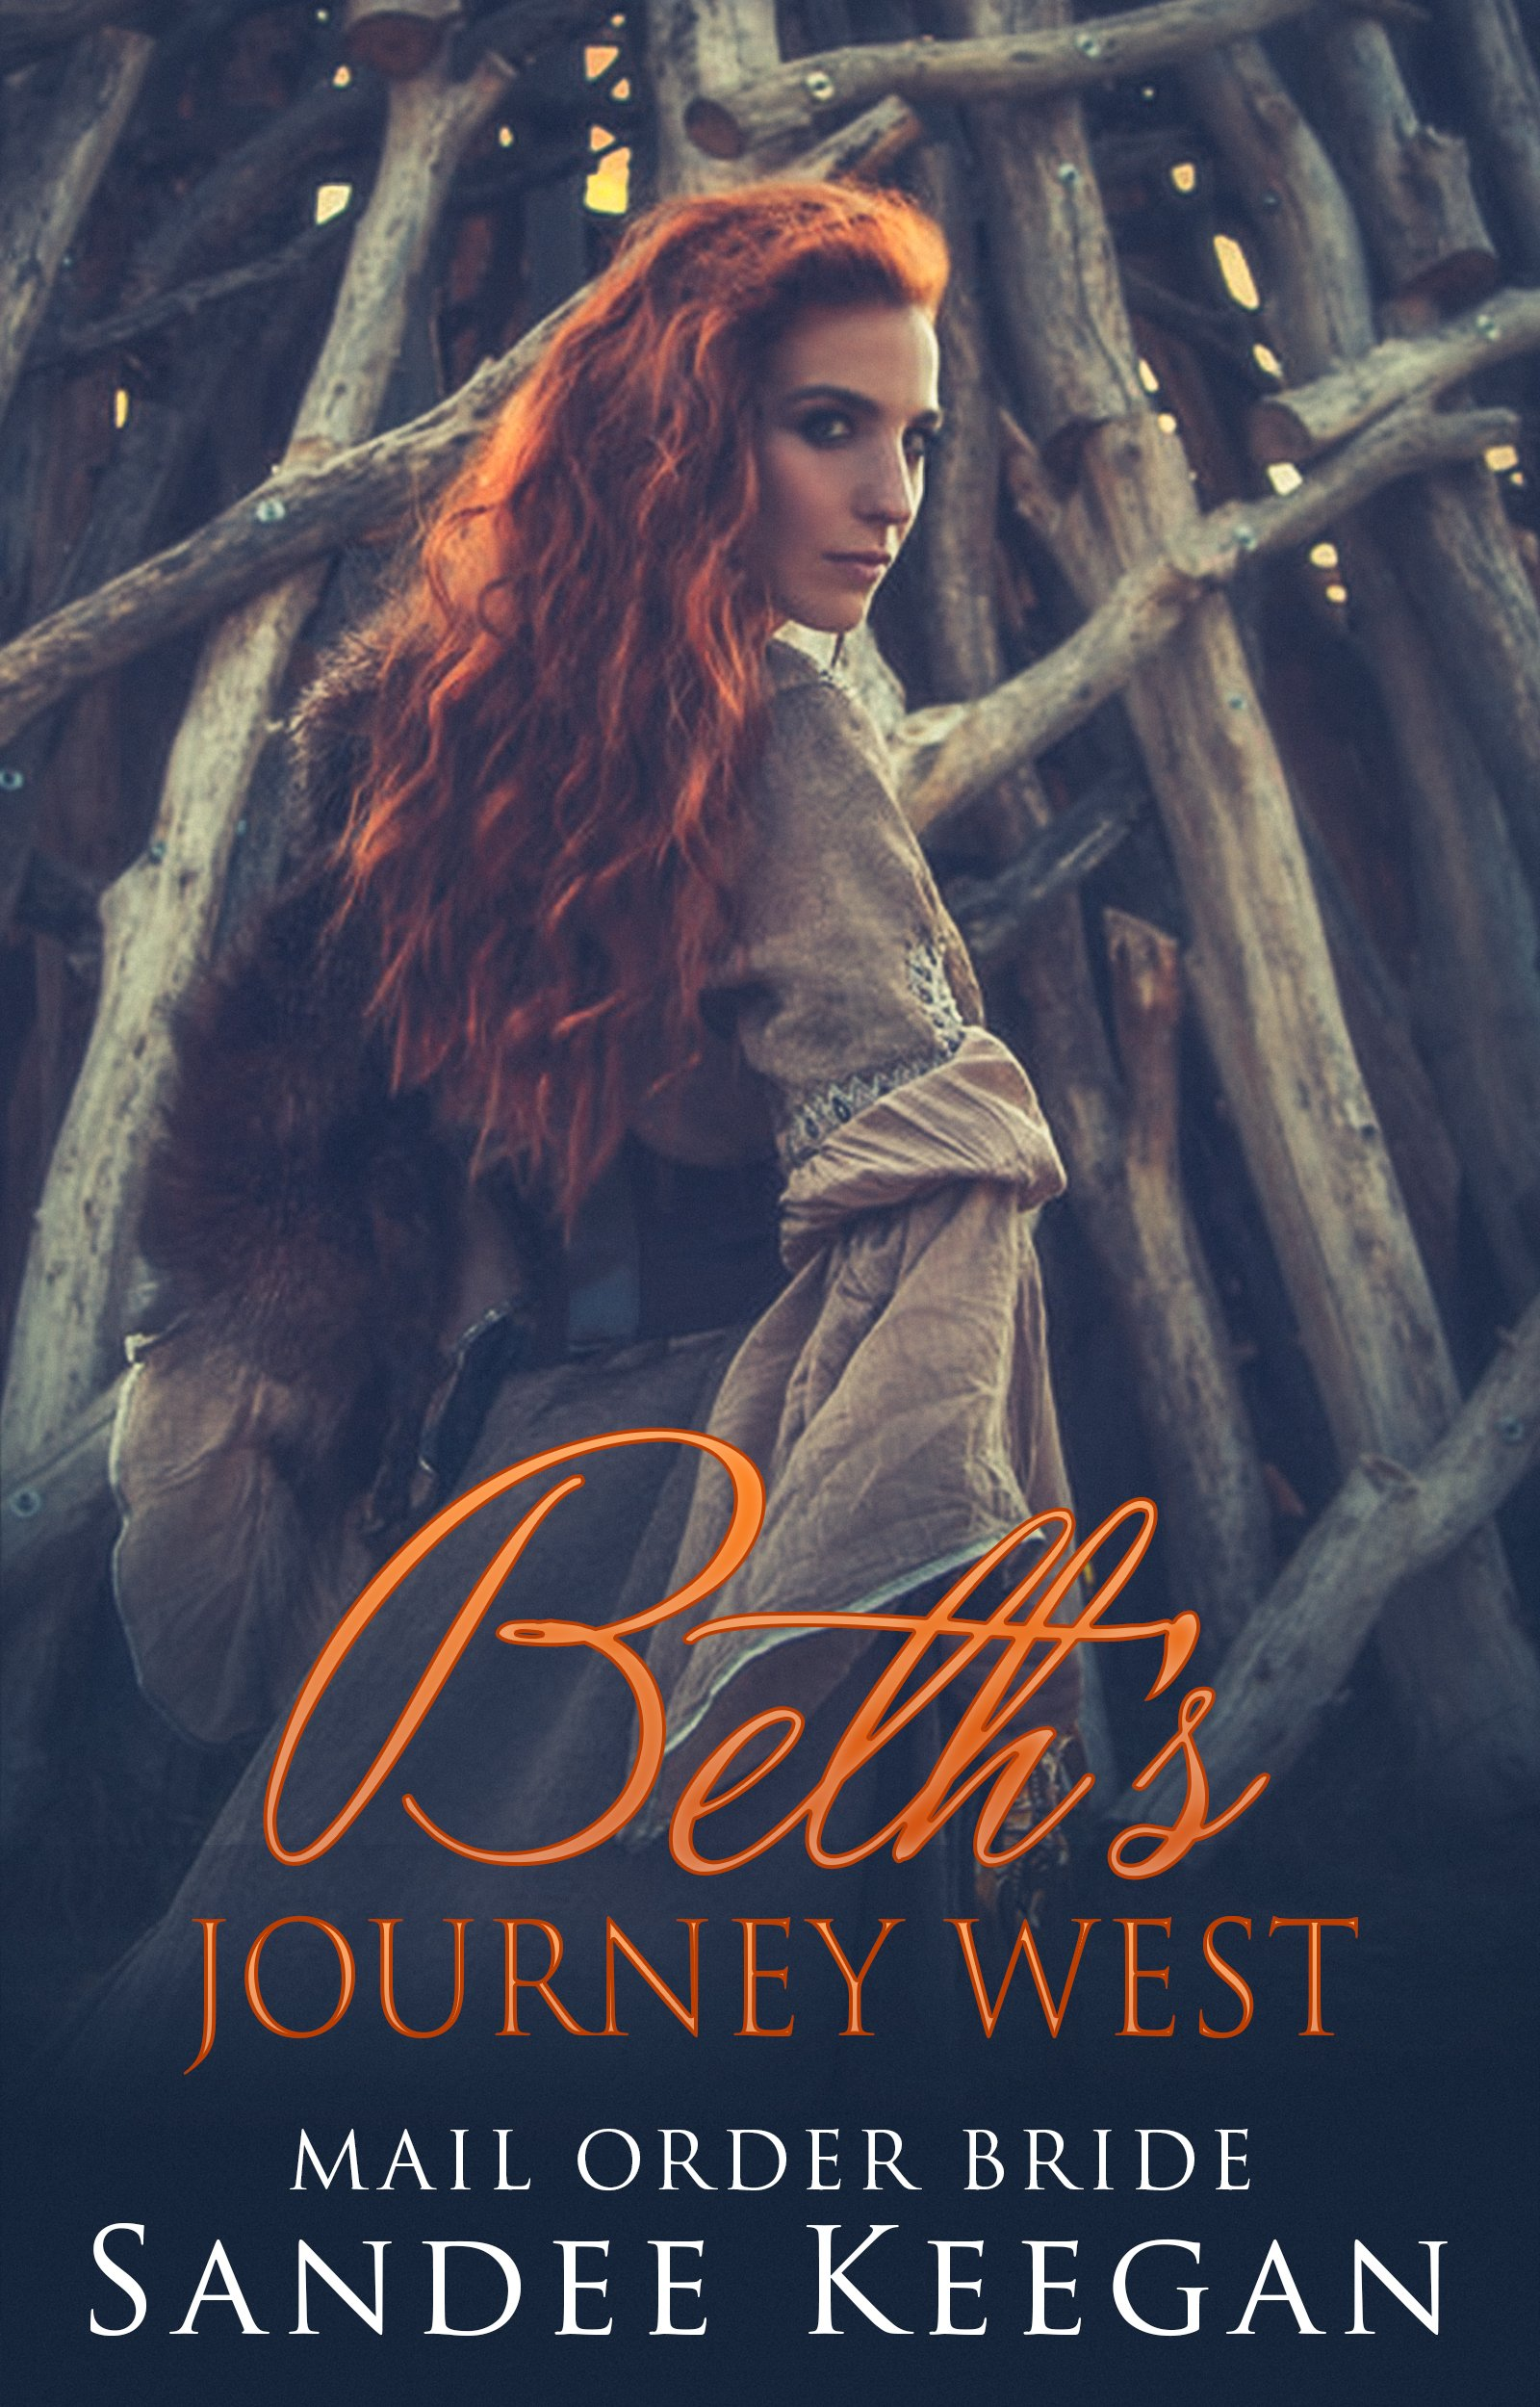 Beth's Journey West: Mail Order Bride